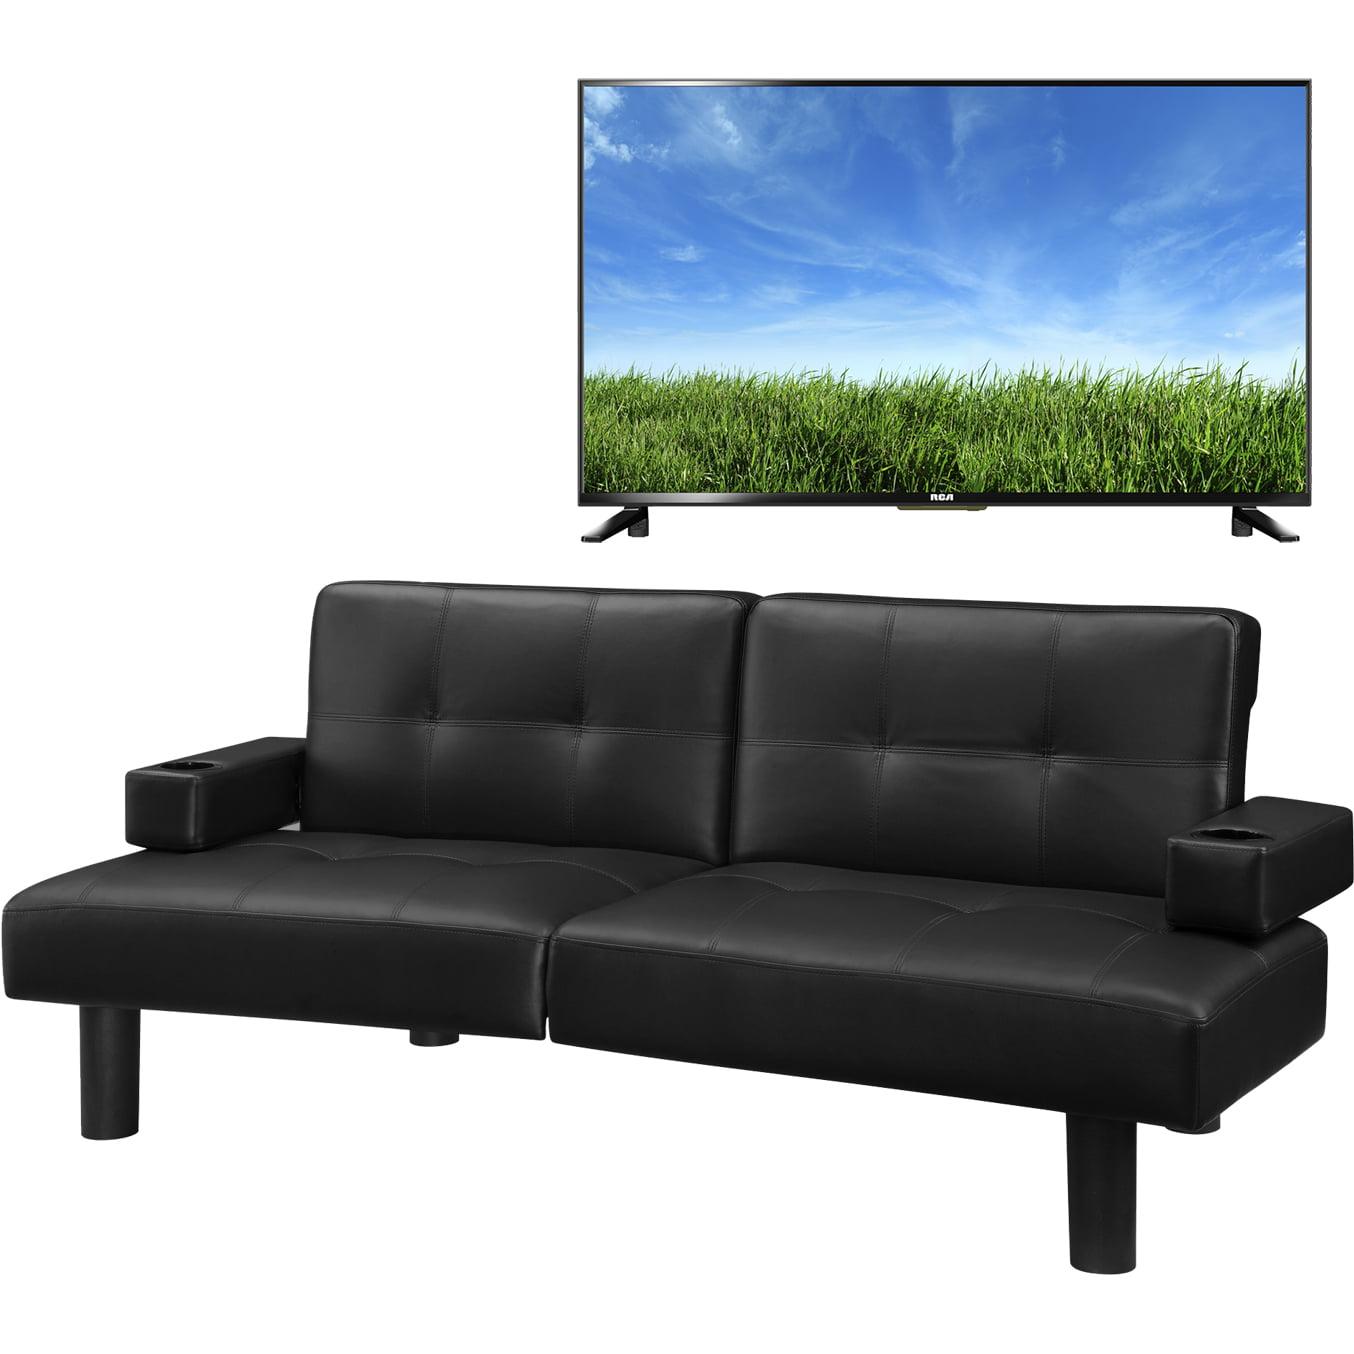 mainstays connectrix faux leather futon 28 images mainstays